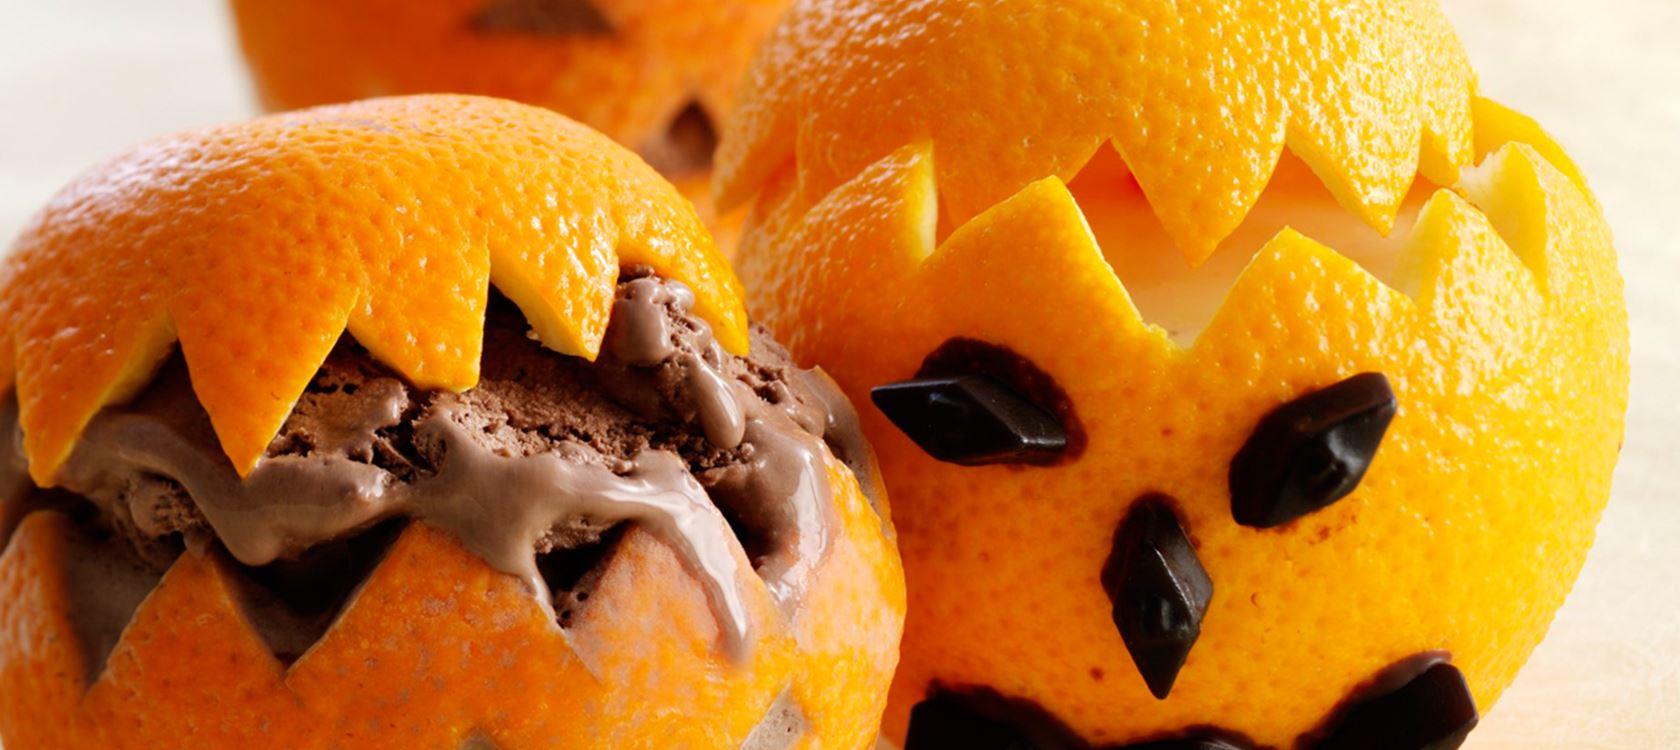 Appelsiinista tarjoiltu appelsiinismoothie